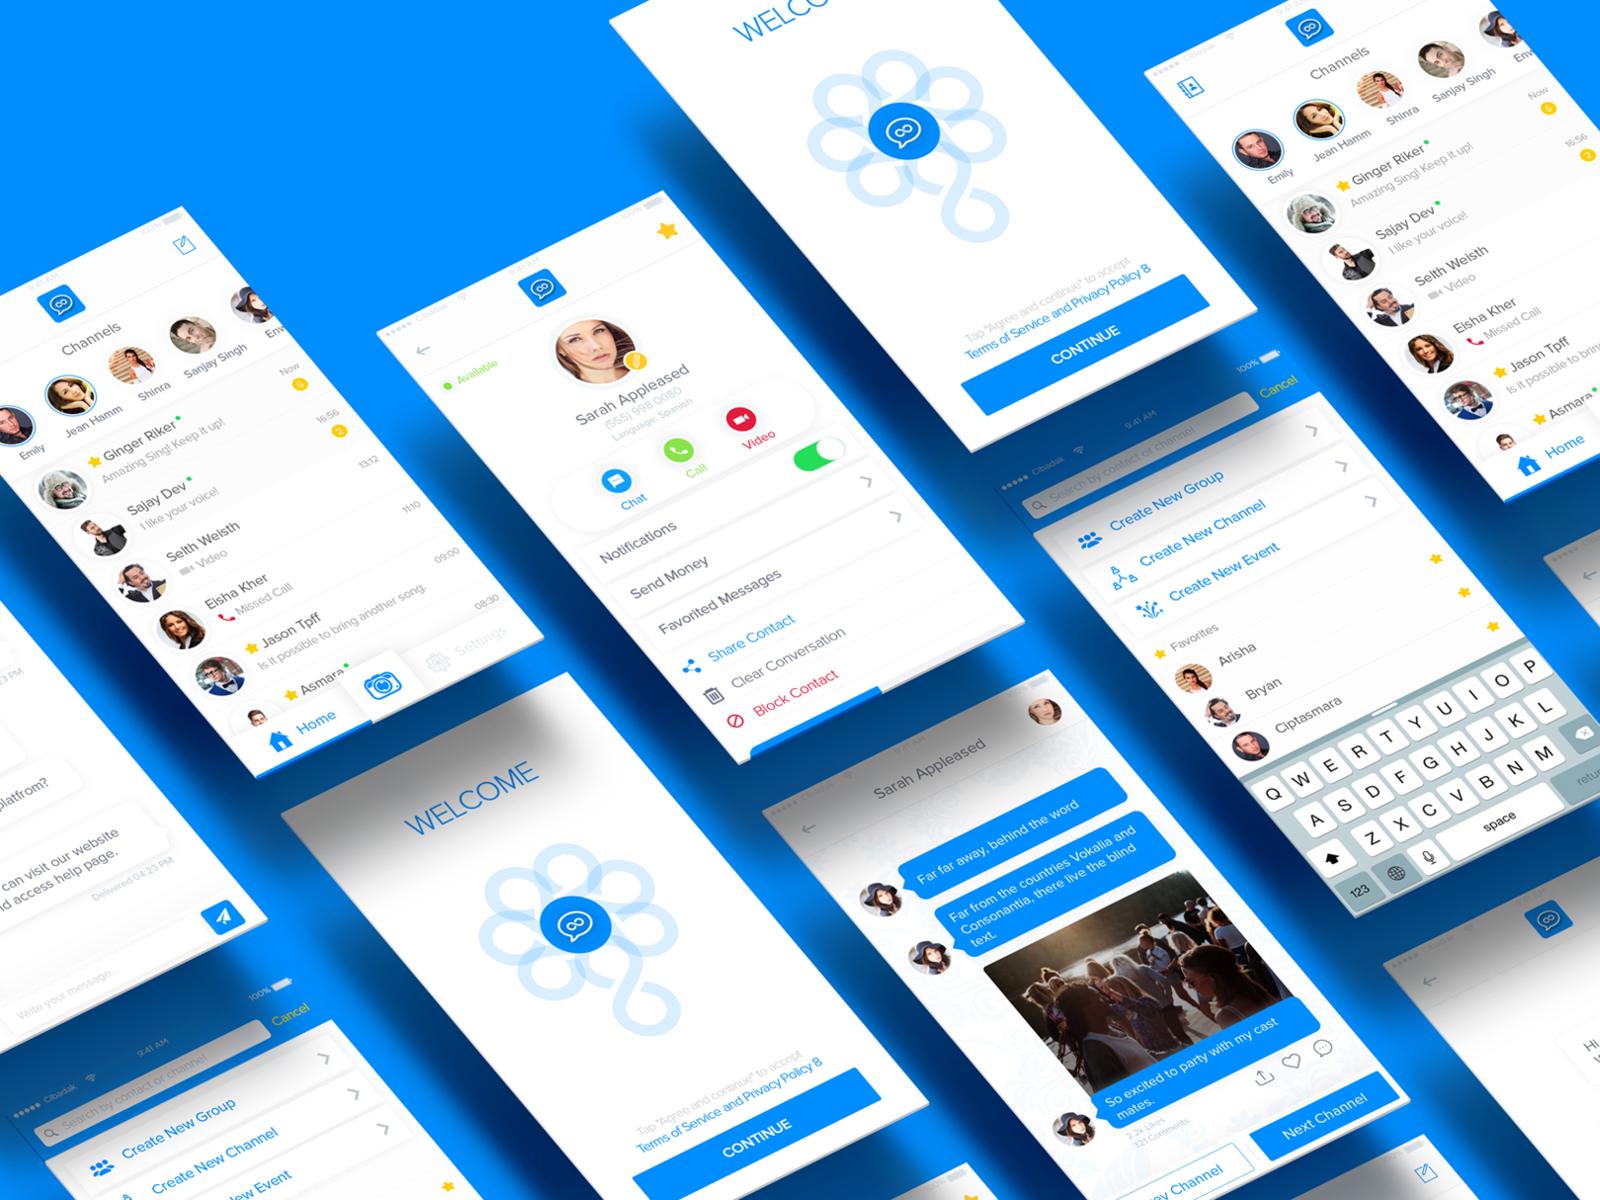 Chatbot App - UpLabs